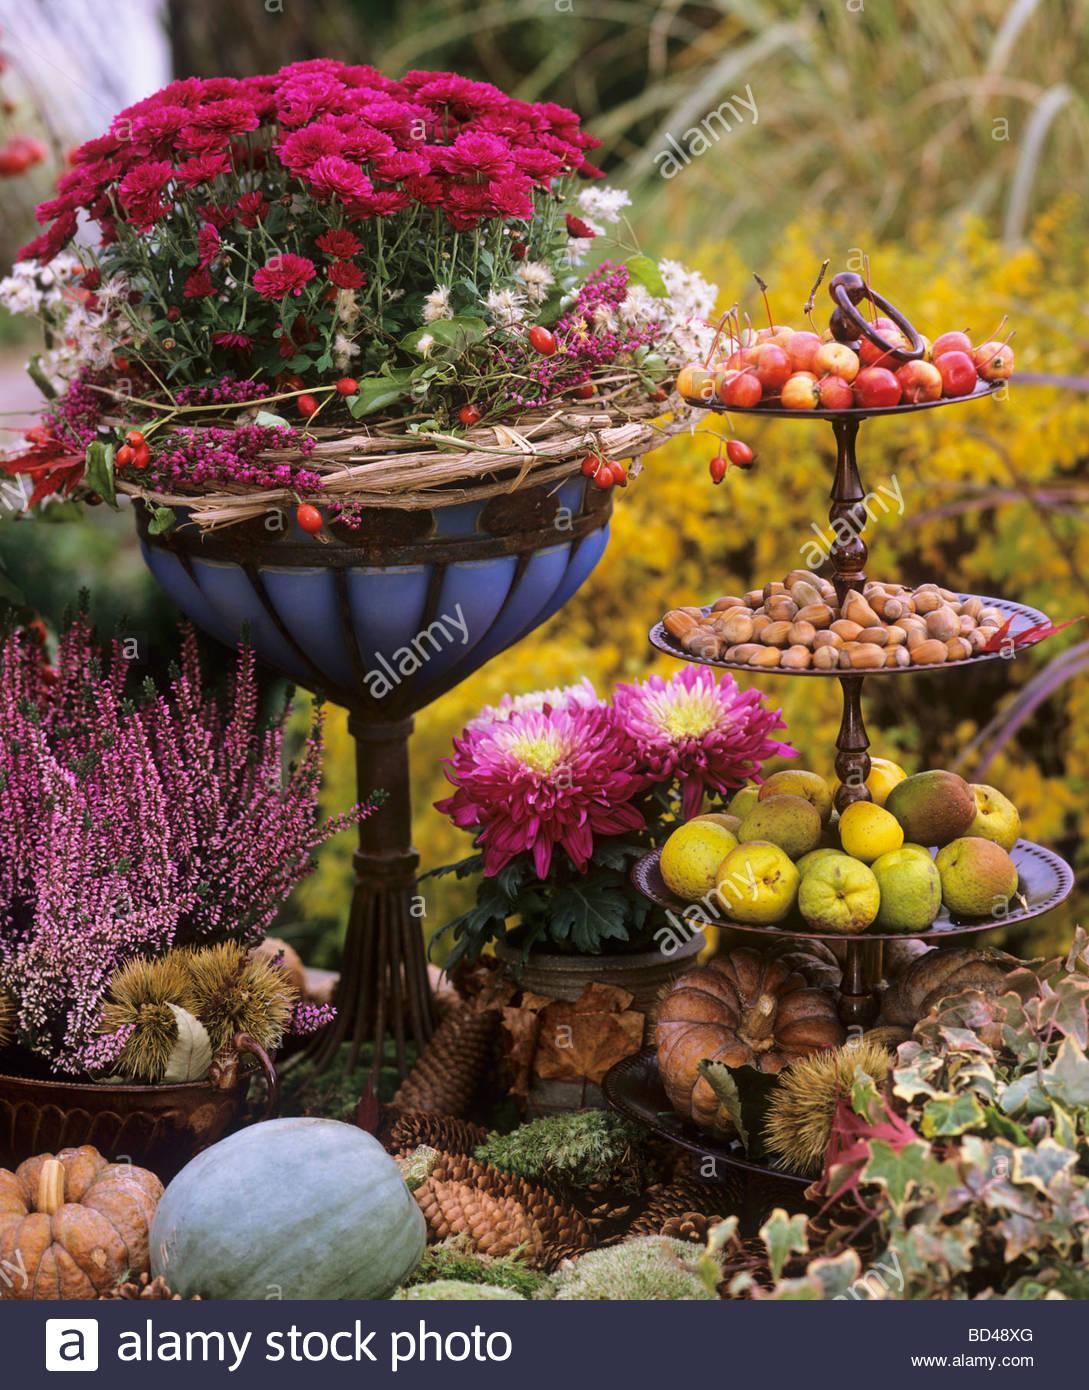 Herbst Dekoration Blumen Kurbisse Apfel Haselnusse Stockfoto